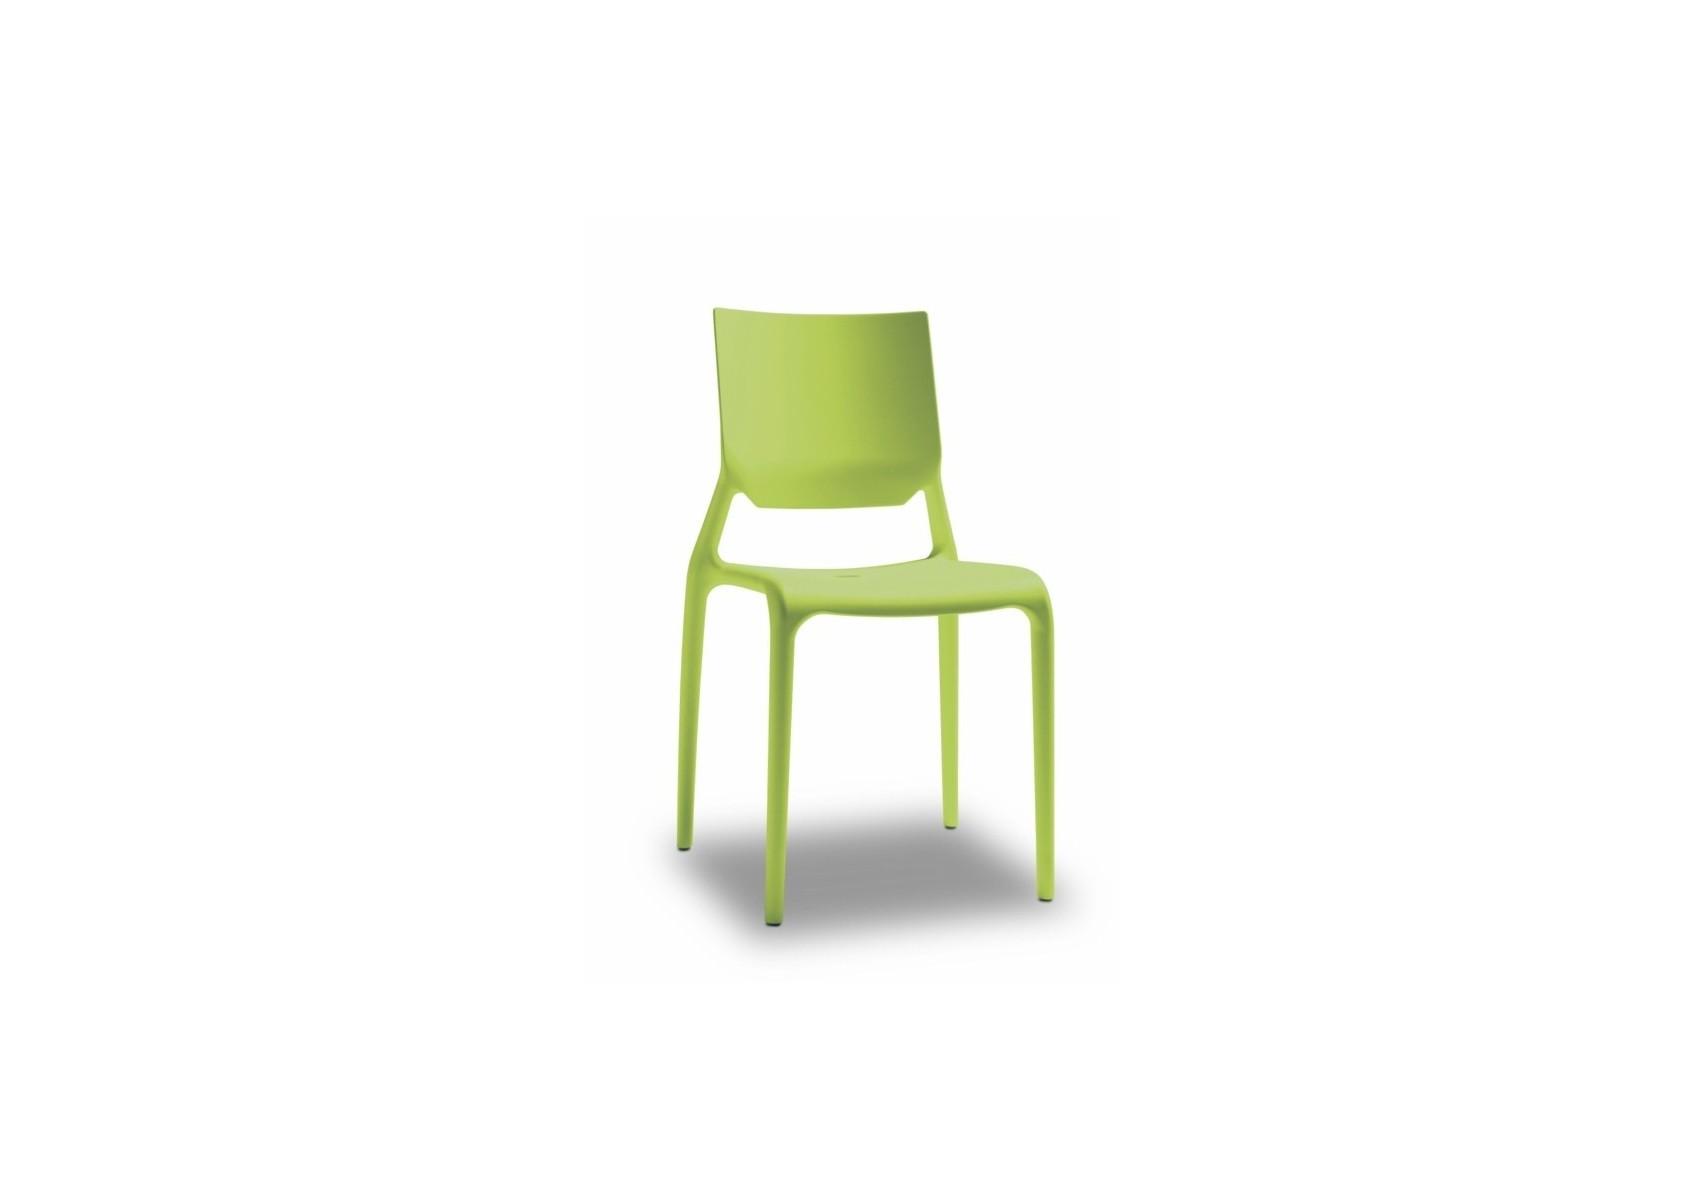 6 chaises design sirio par scab design boite design for Lot de 6 chaises design